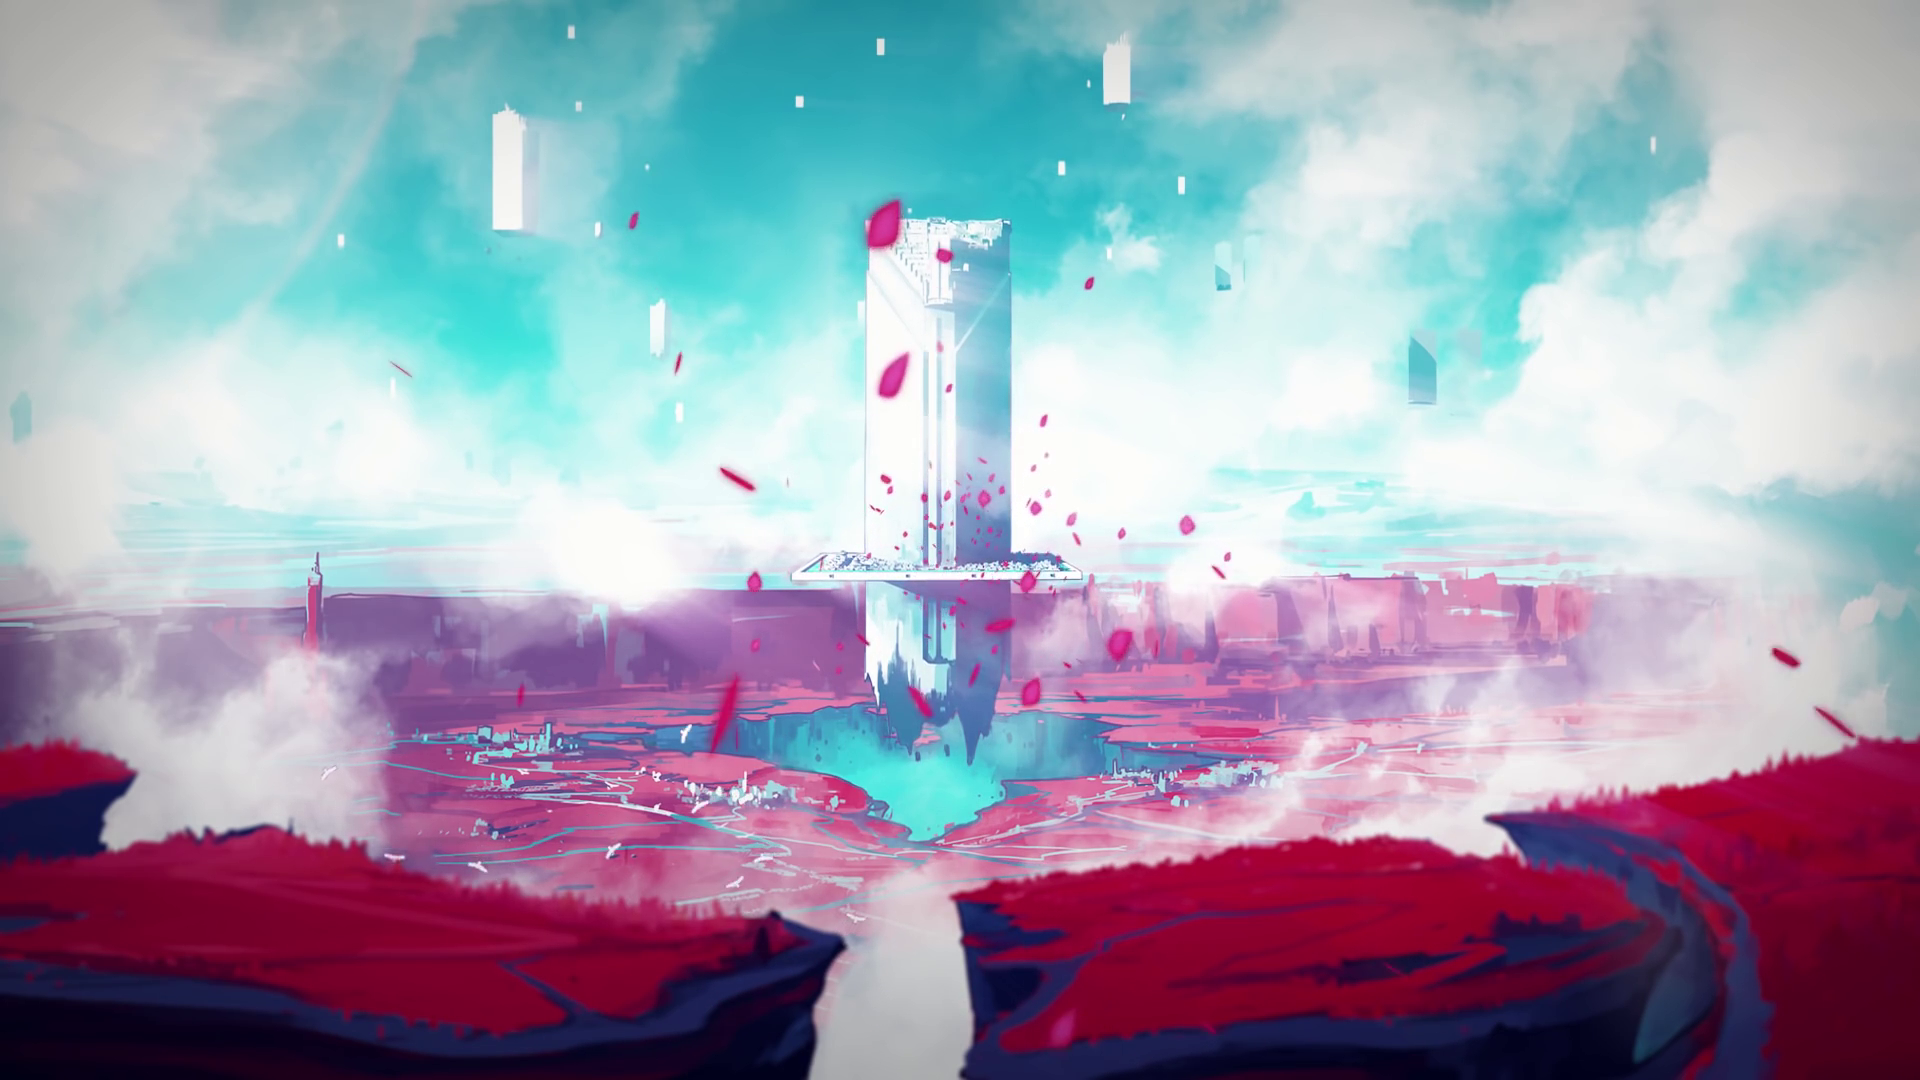 Artwork - The Monolith